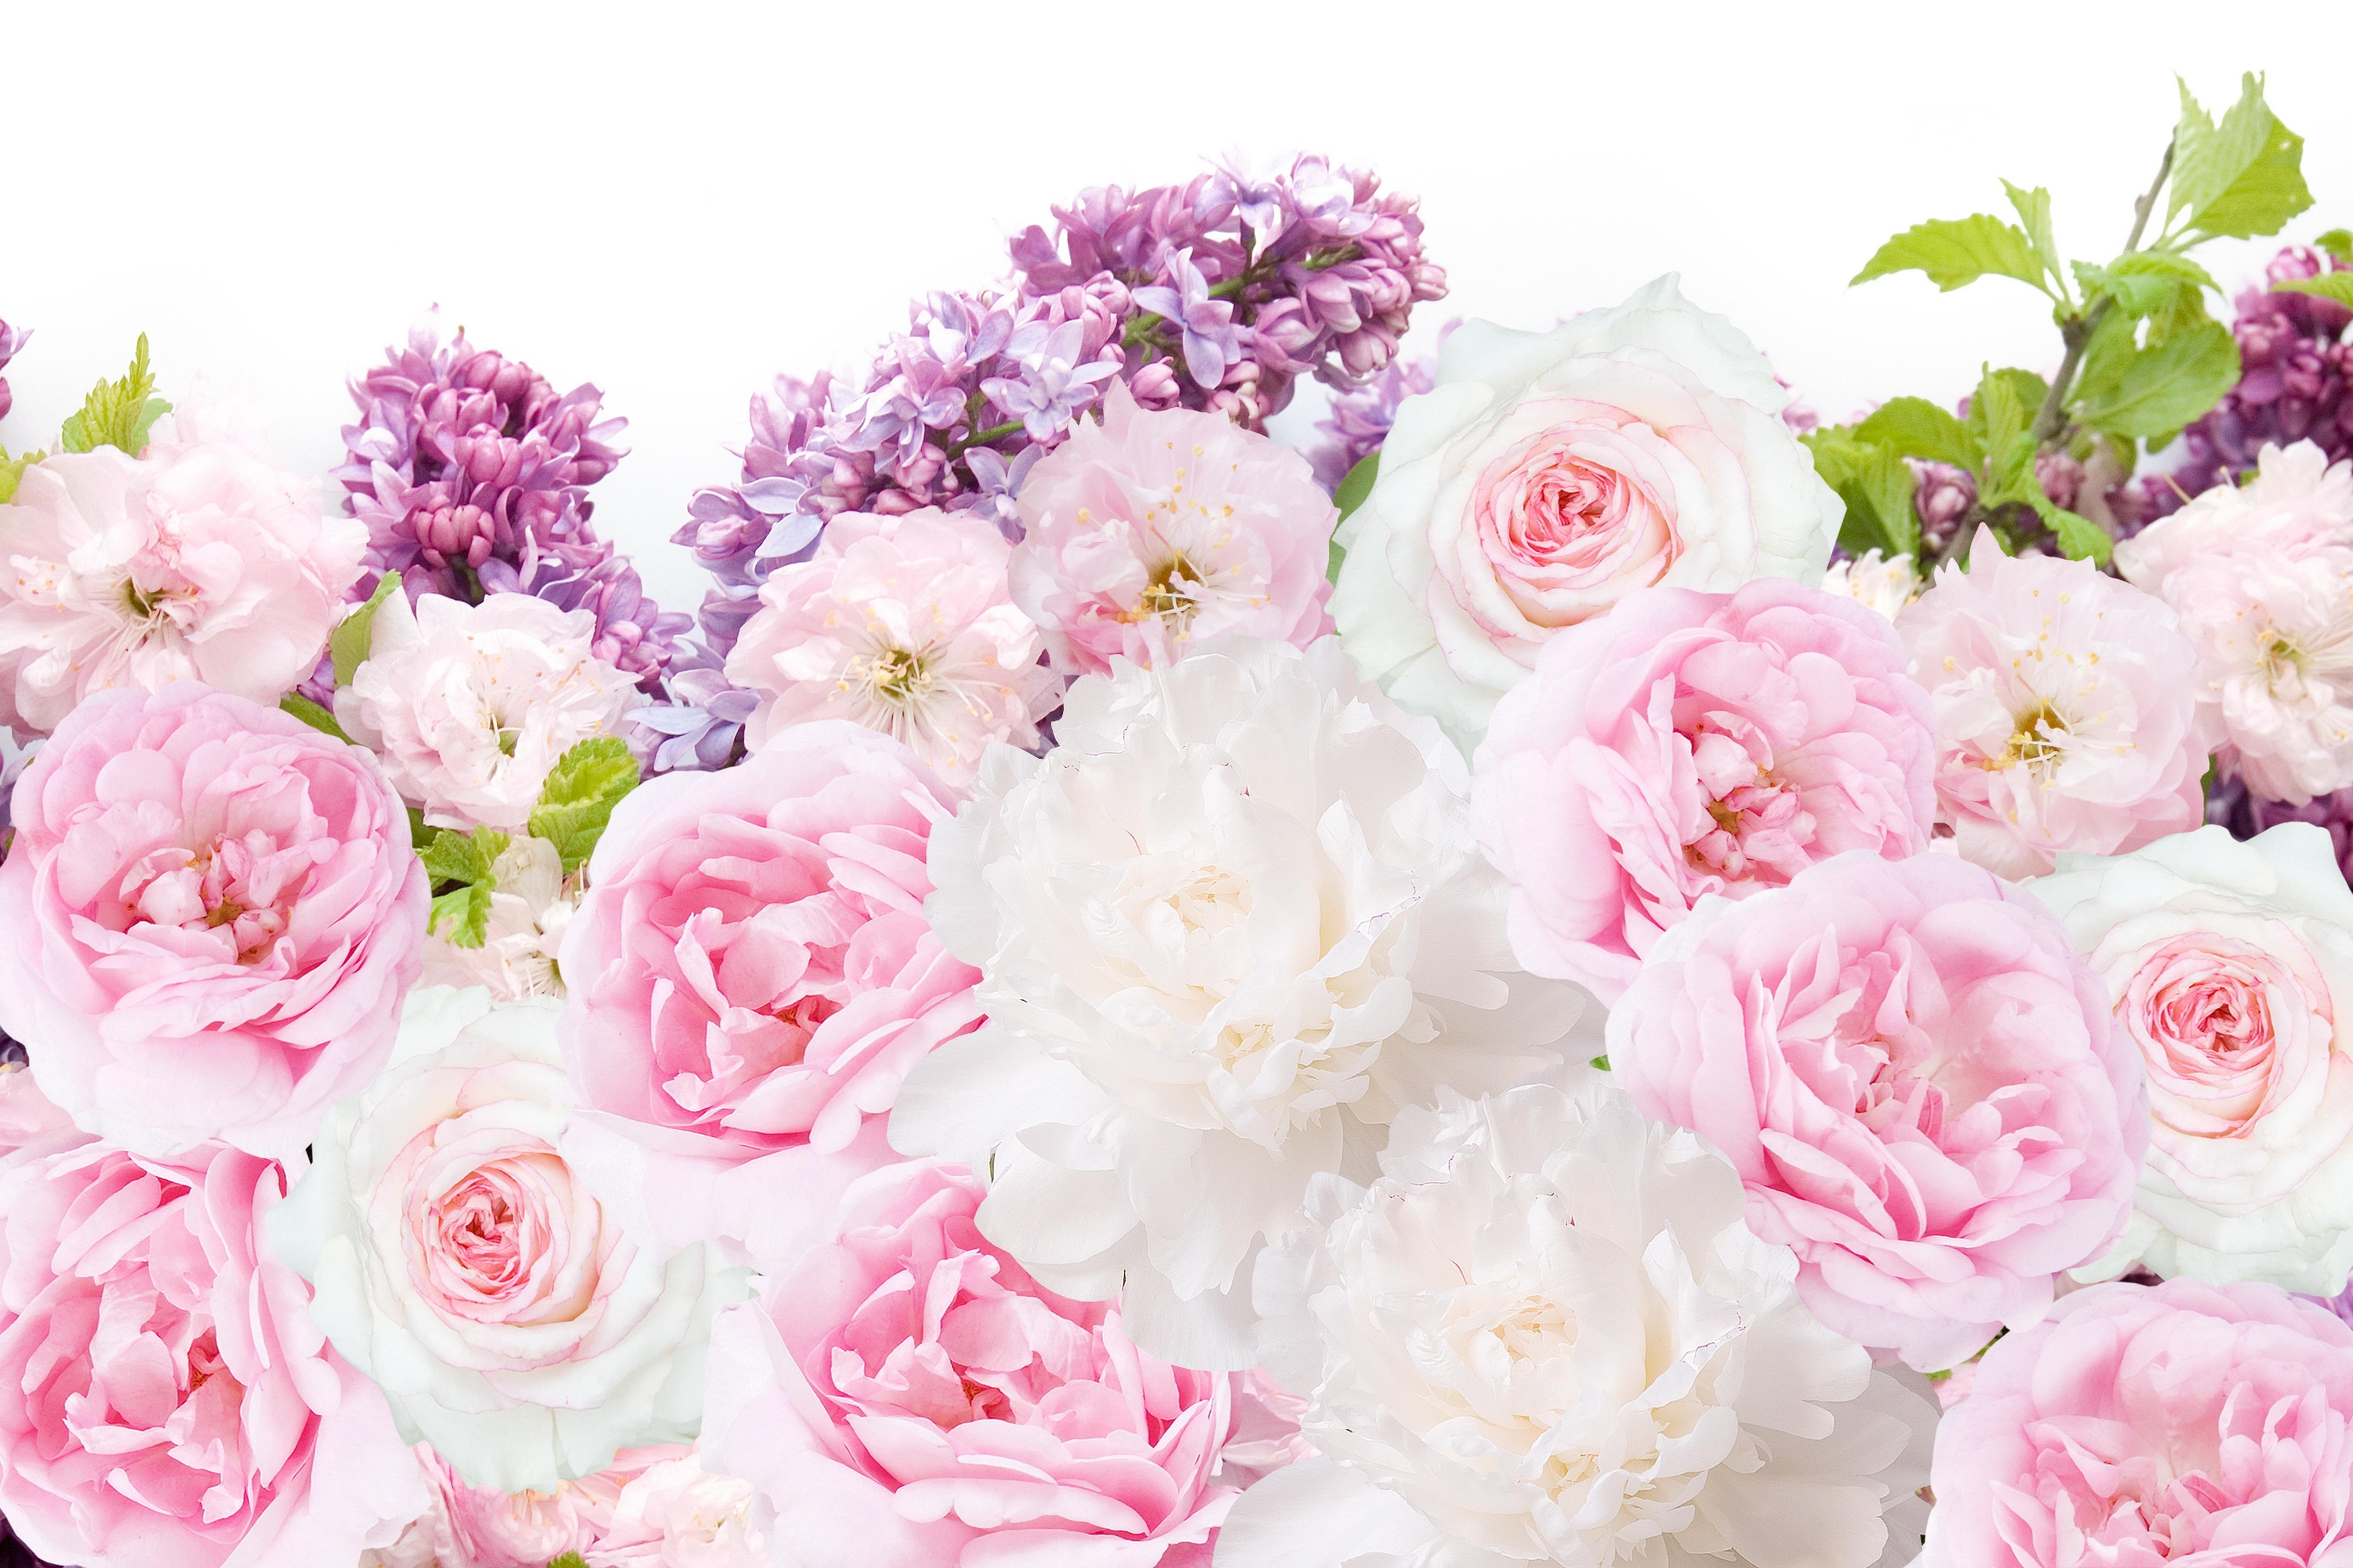 Light Pink Peonies Bouquet Wallpapers - Wallpaper Cave